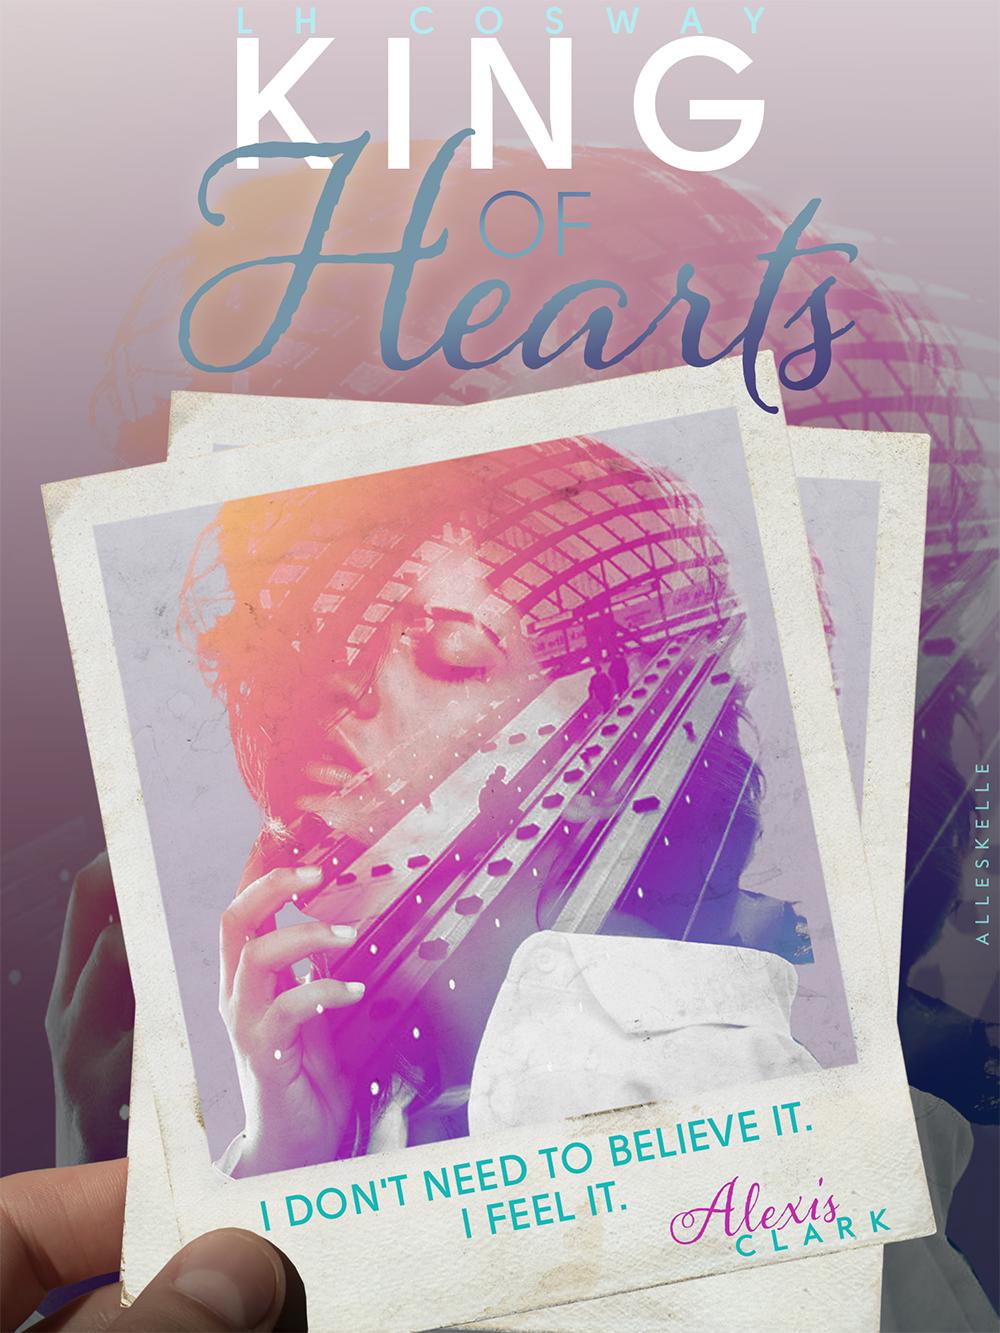 King_of_Hearts_alleskelle_3